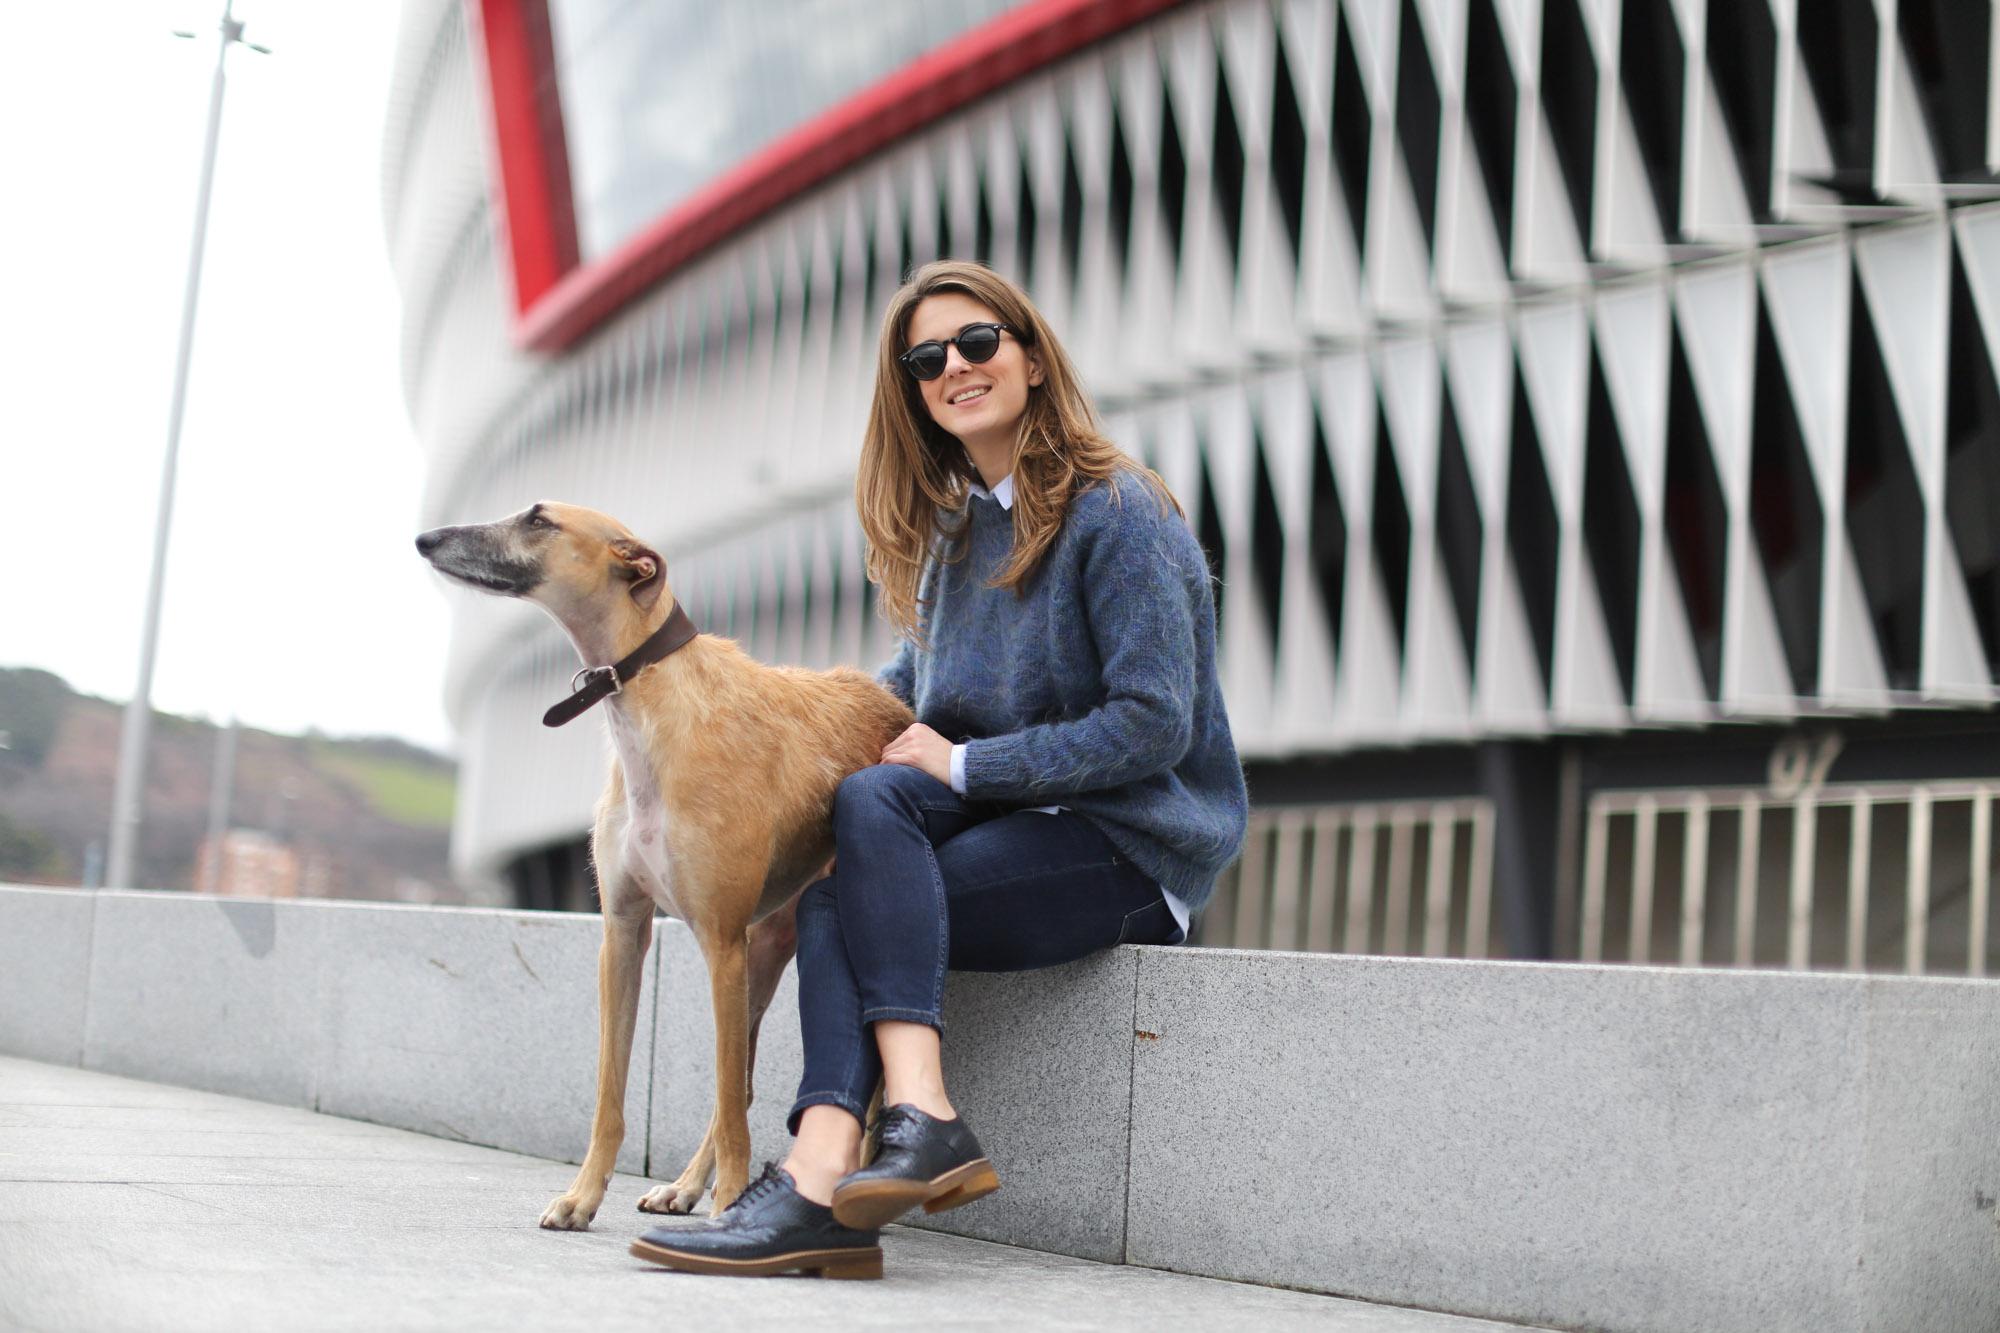 Clochet-streetstyle-bimbaylola-blue-knit-topshop-baxter-jeans-sushibag-10